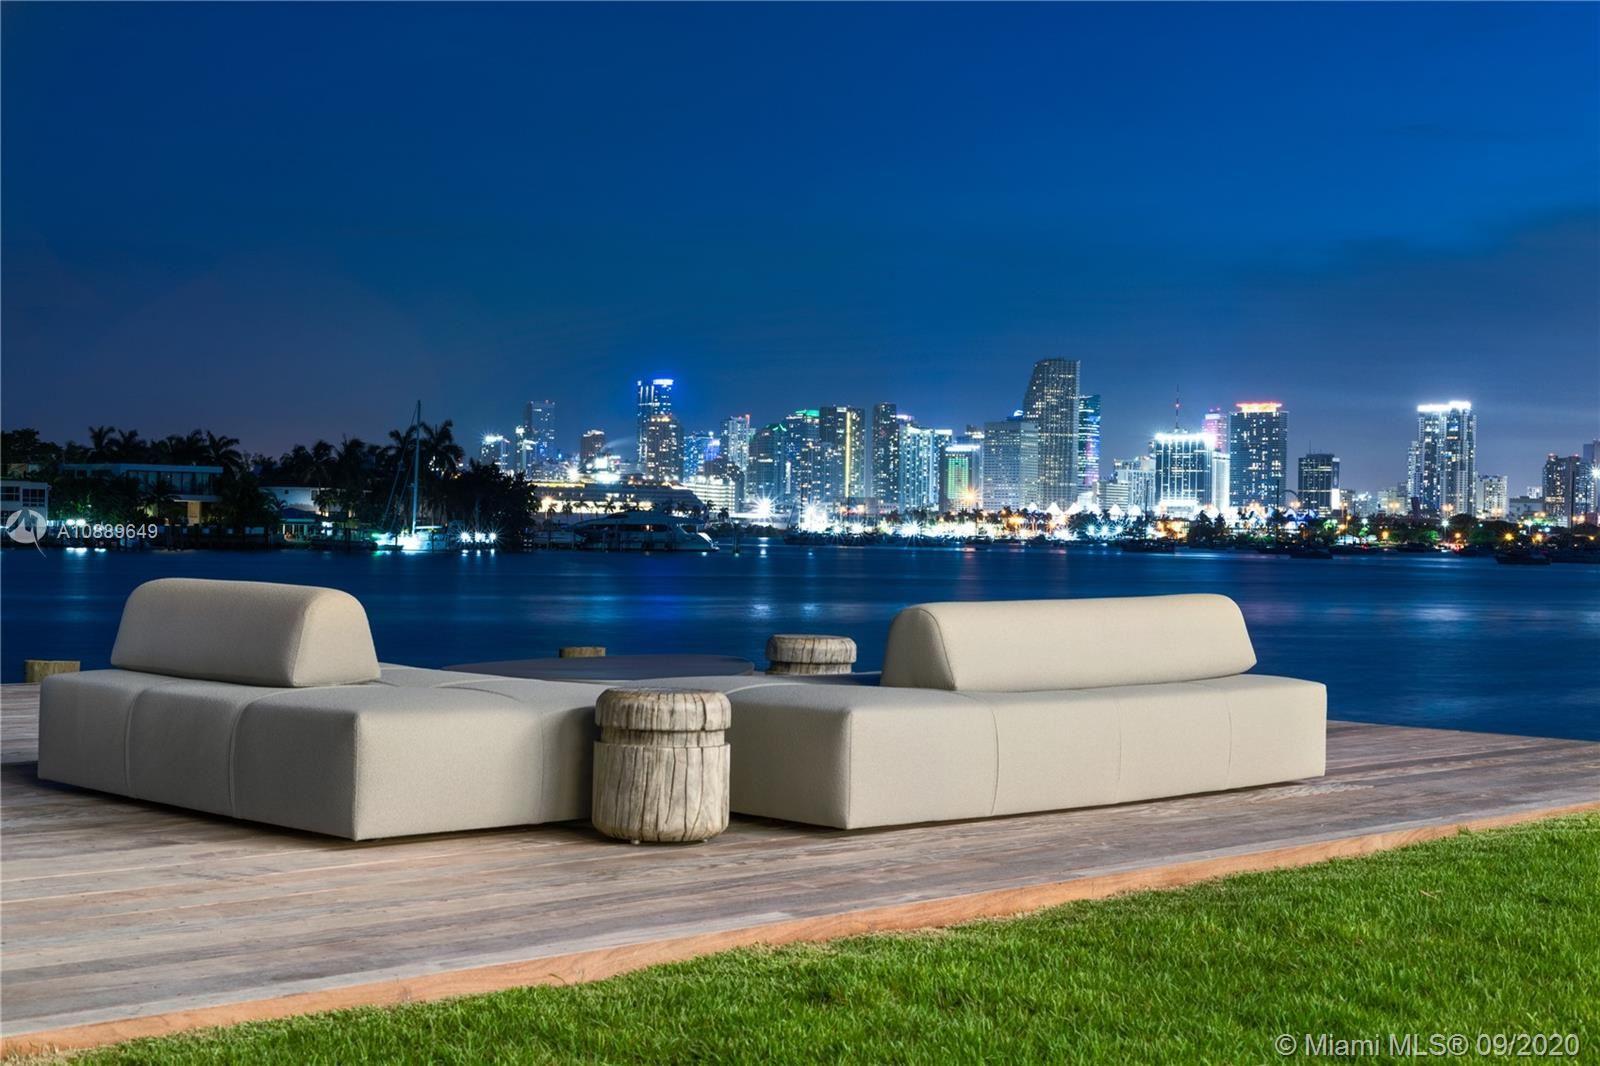 Photo 8 of Listing MLS a10889649 in 10 W San Marino Dr Miami Beach FL 33139